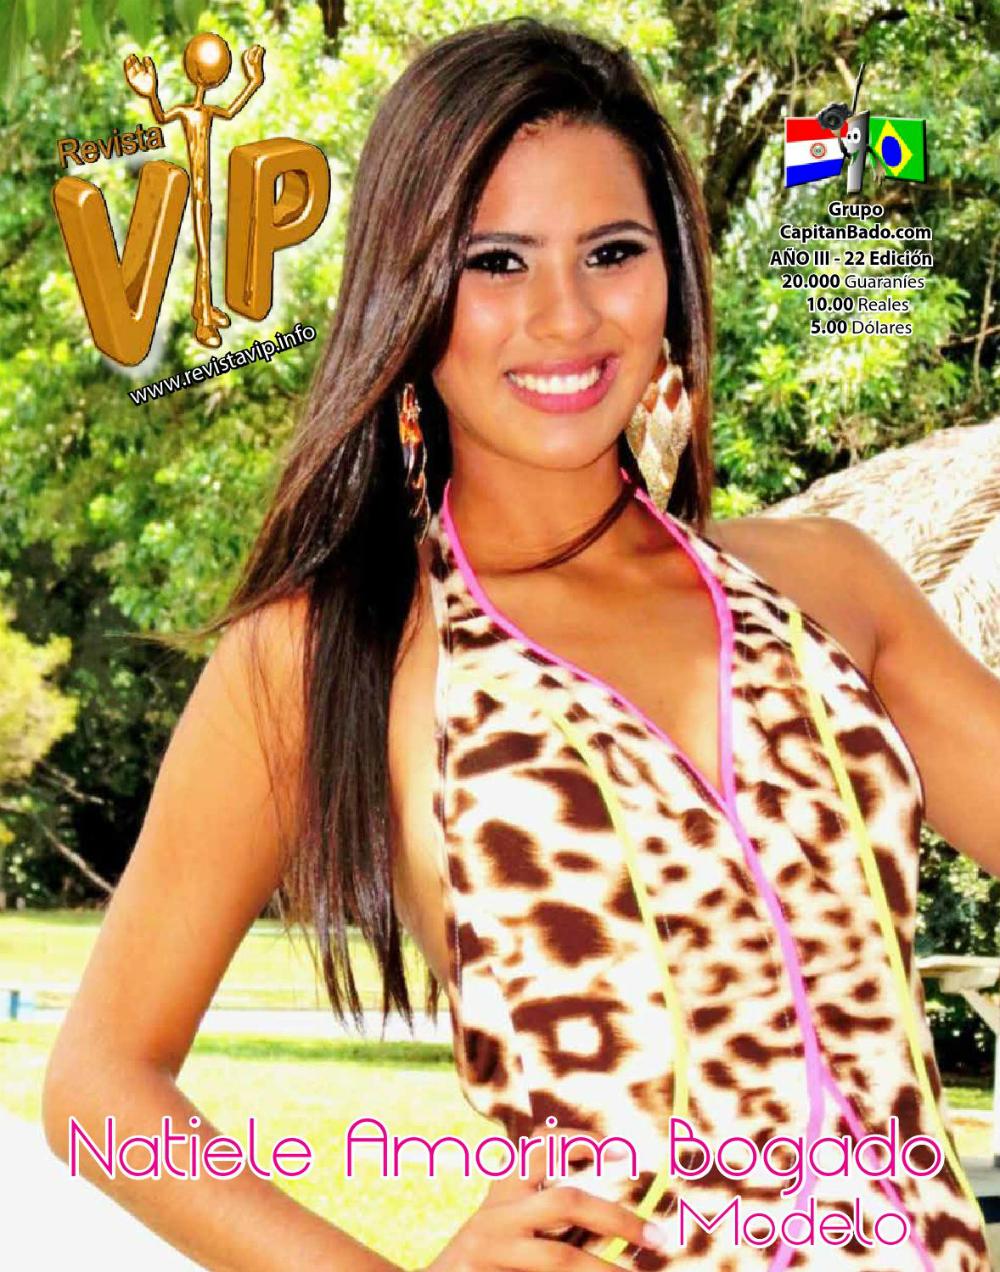 Vip 22 Paraguay